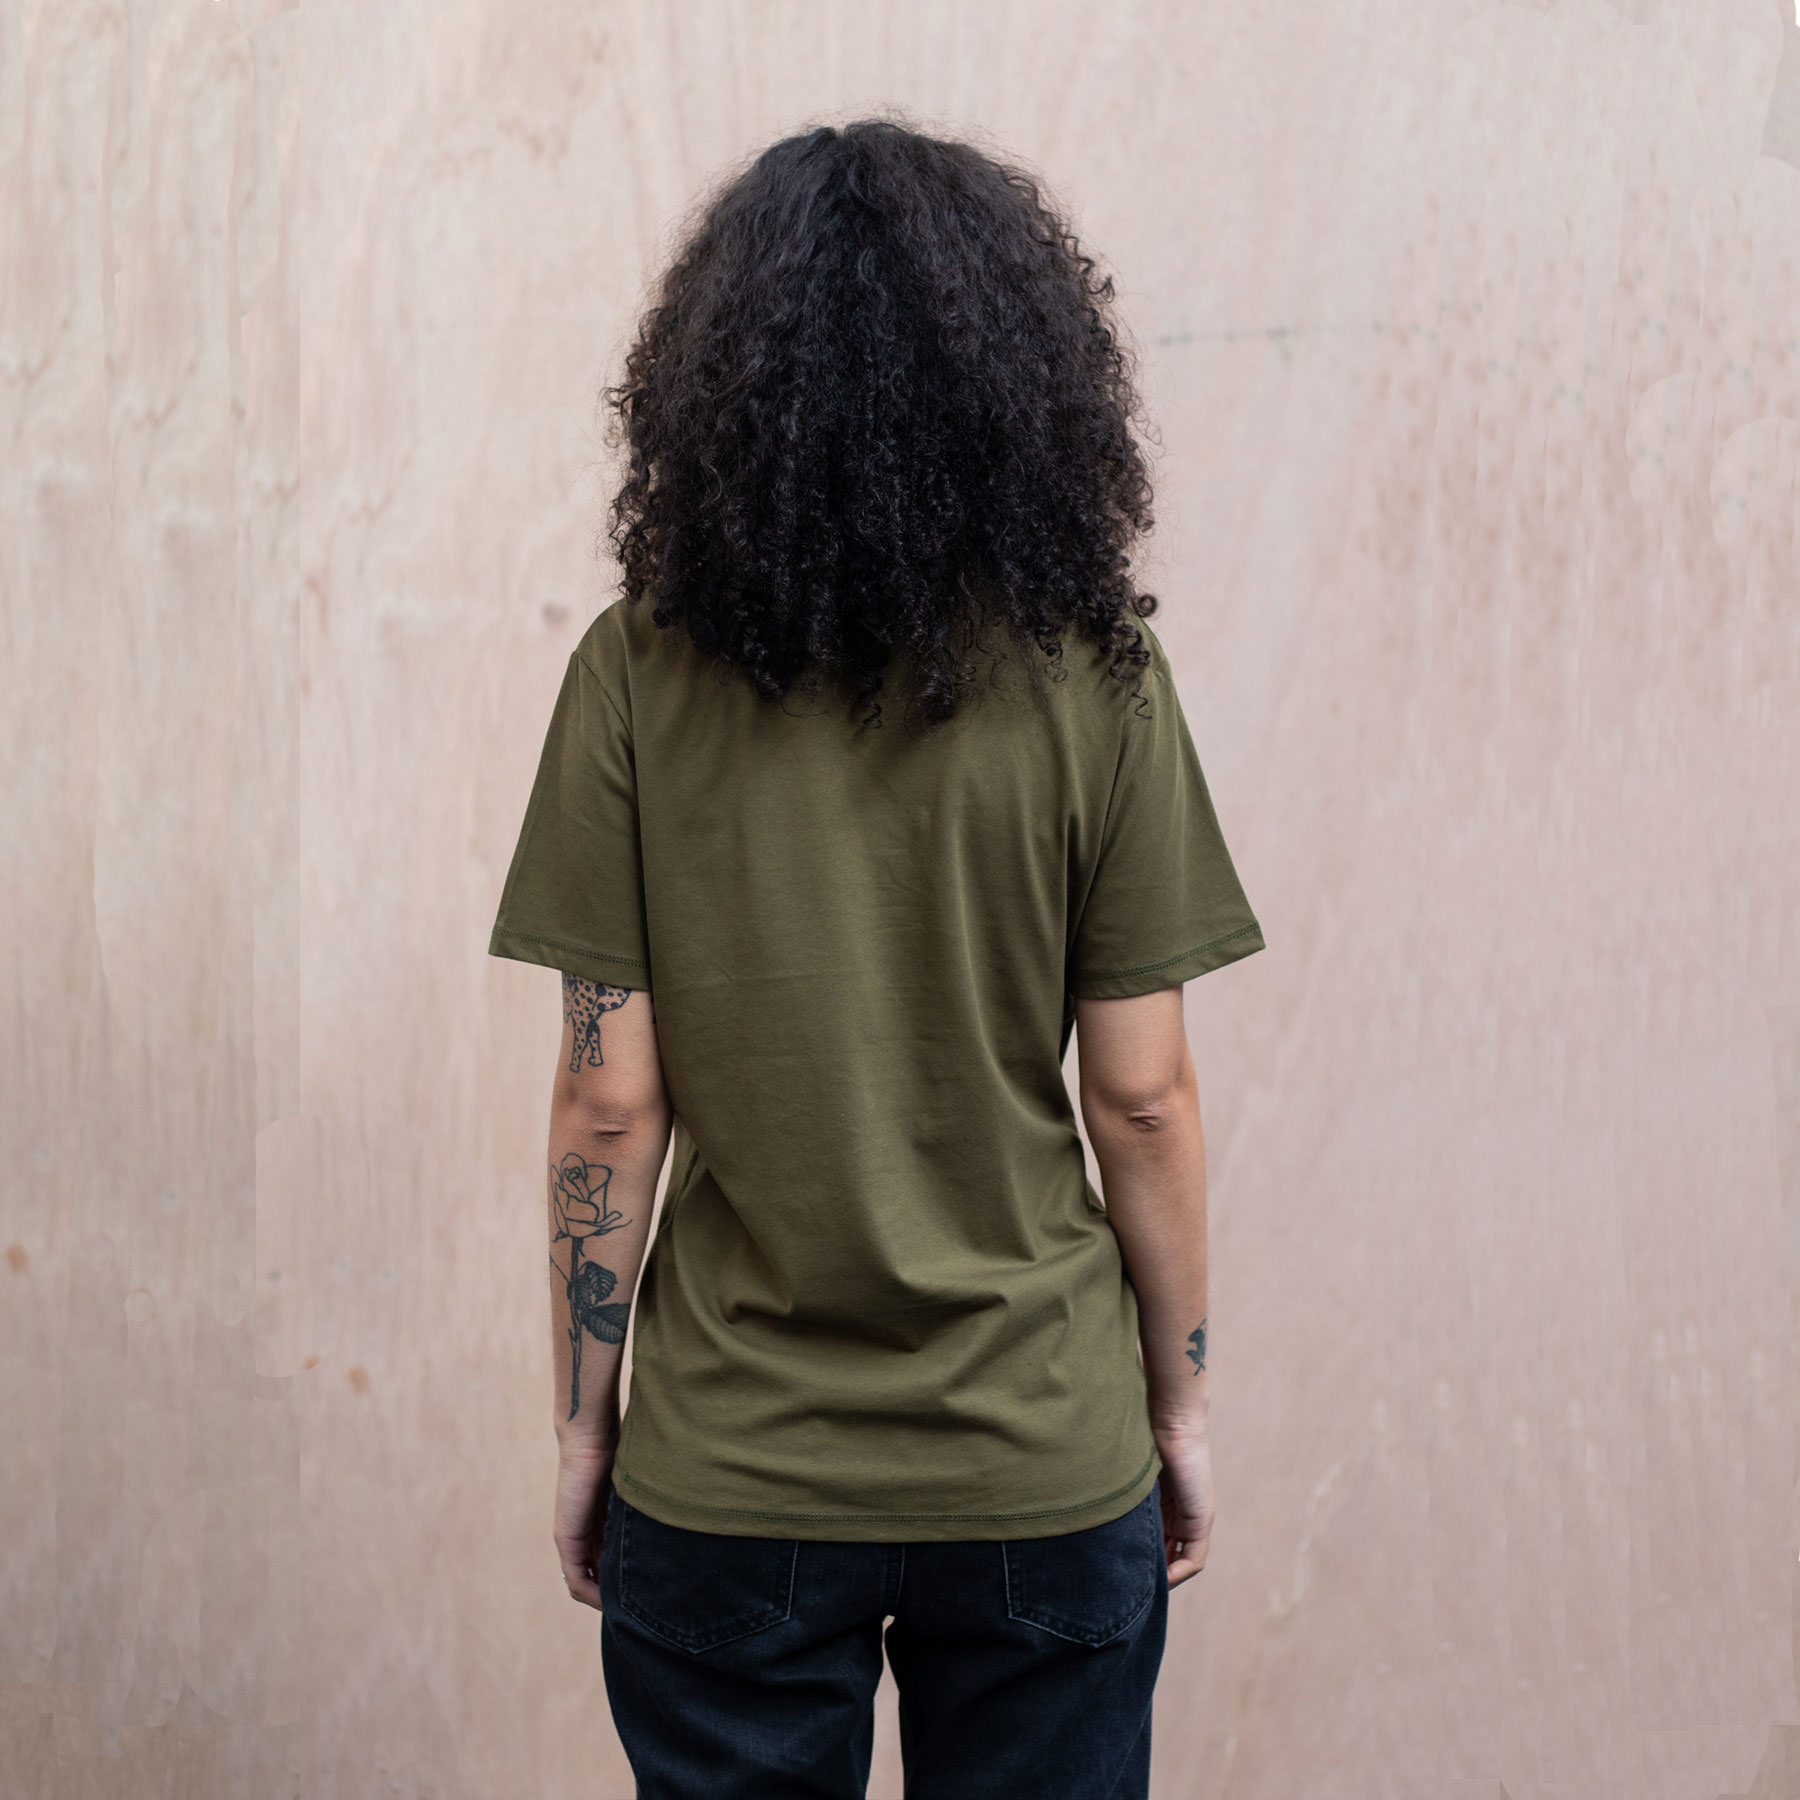 Bamfrod-tee-khaki-womens-back-.jpg